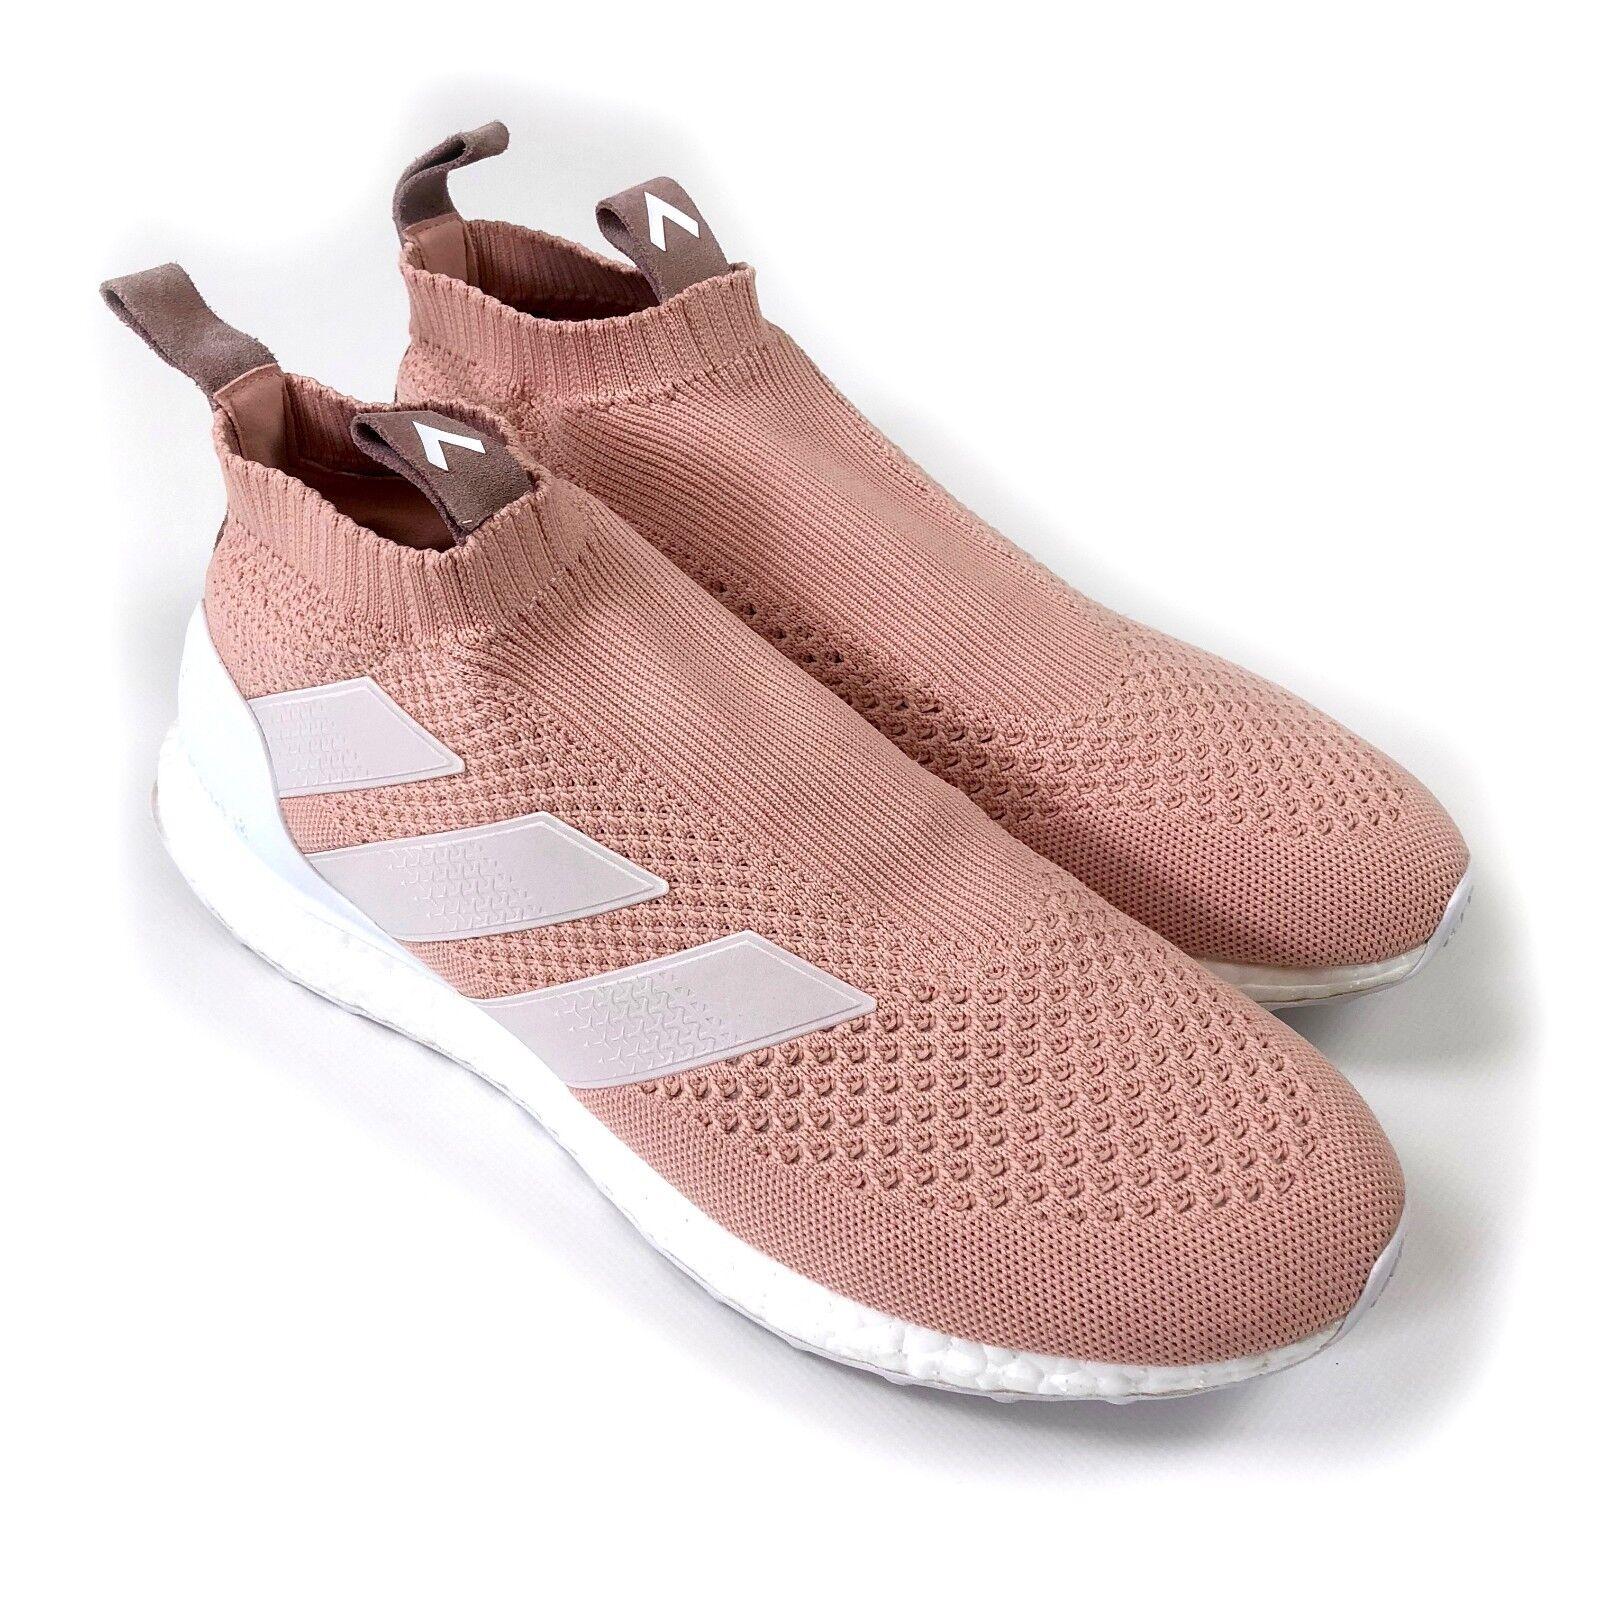 Adidas x Kith Ace 16+ purecontrol ultra Boost  flamingo  tamaño 46